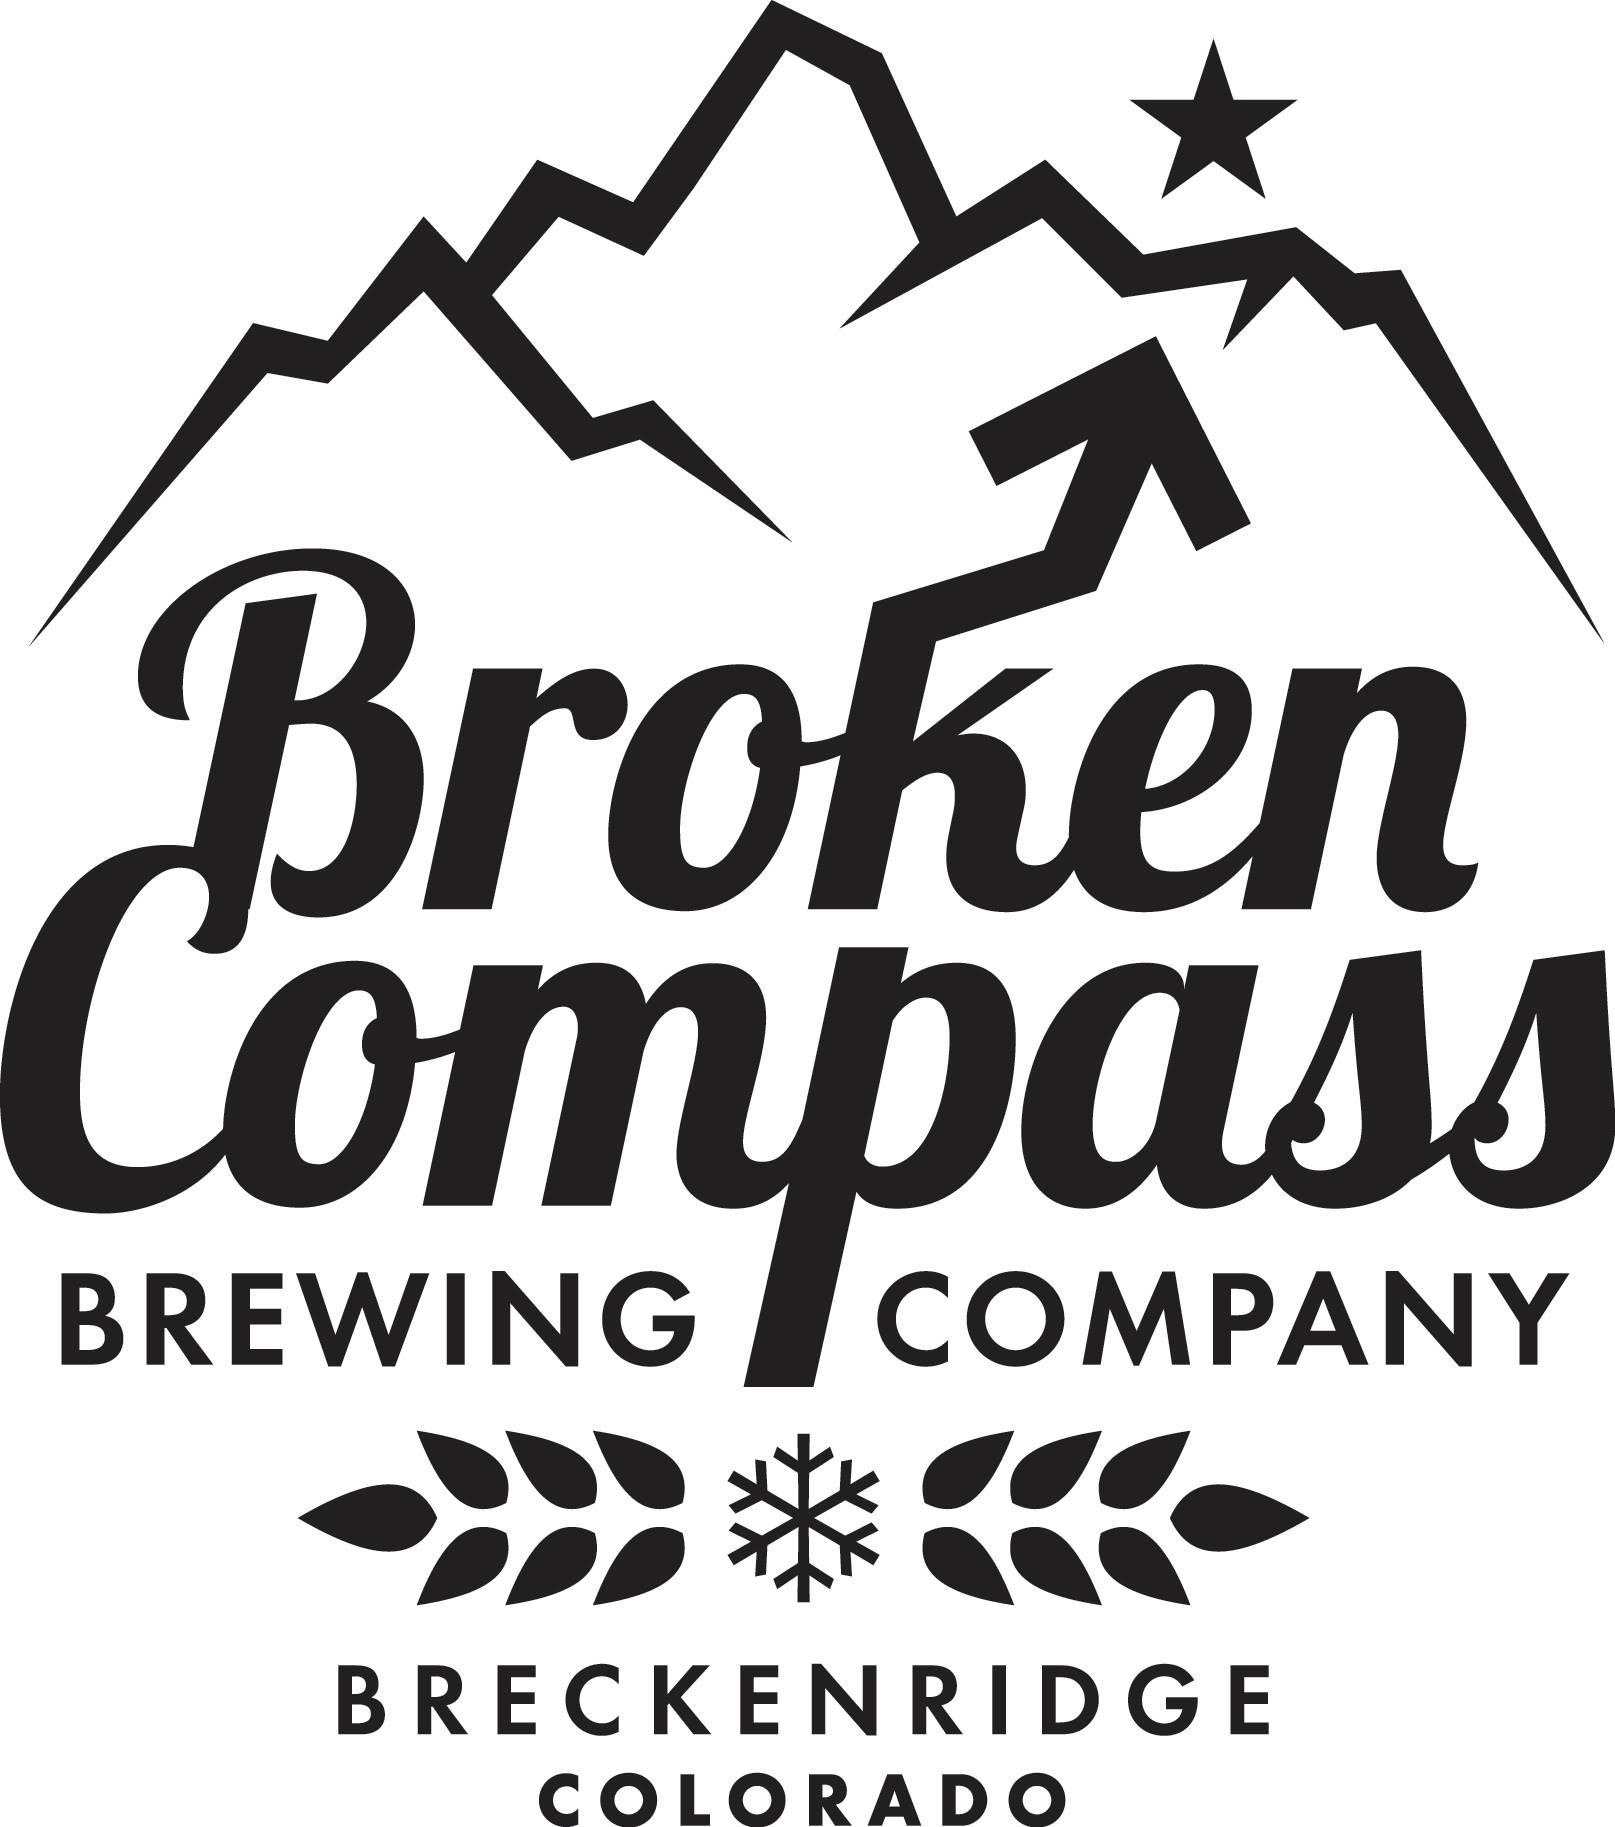 Broken-Compass-Logo-breckenridge.jpg